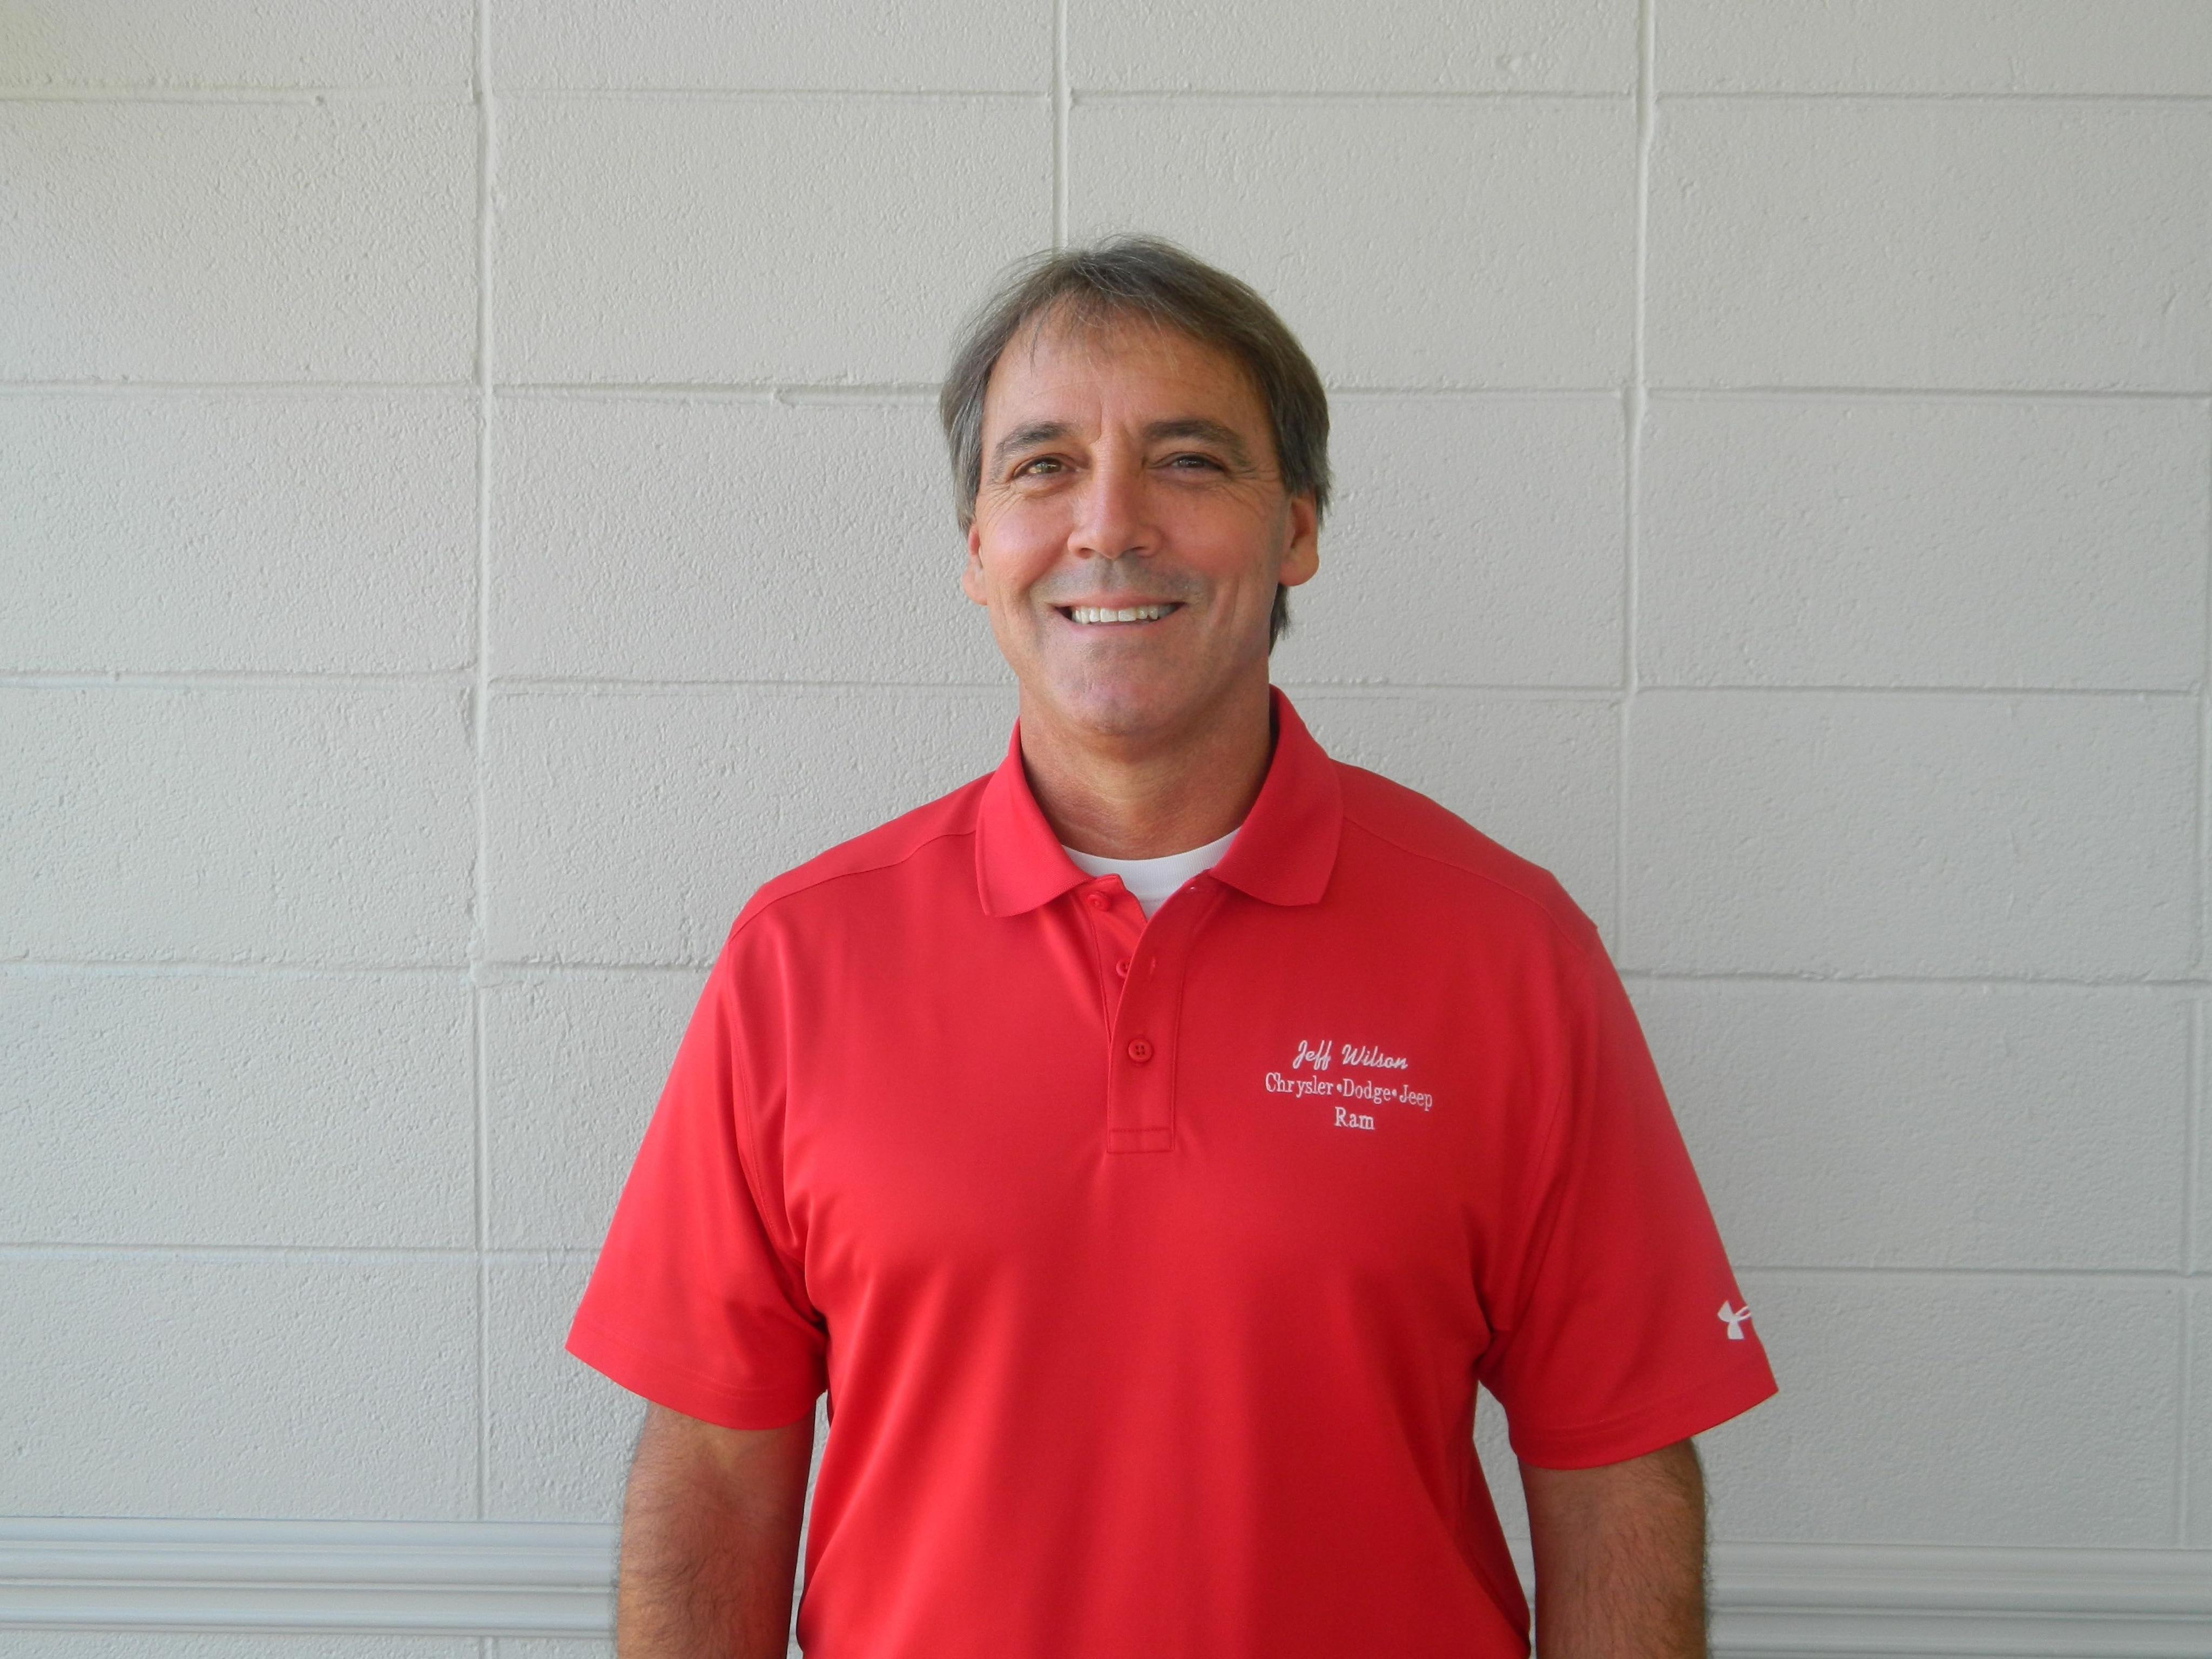 Staff Jeff Wilson Cdjr Brookhaven Jackson Ms